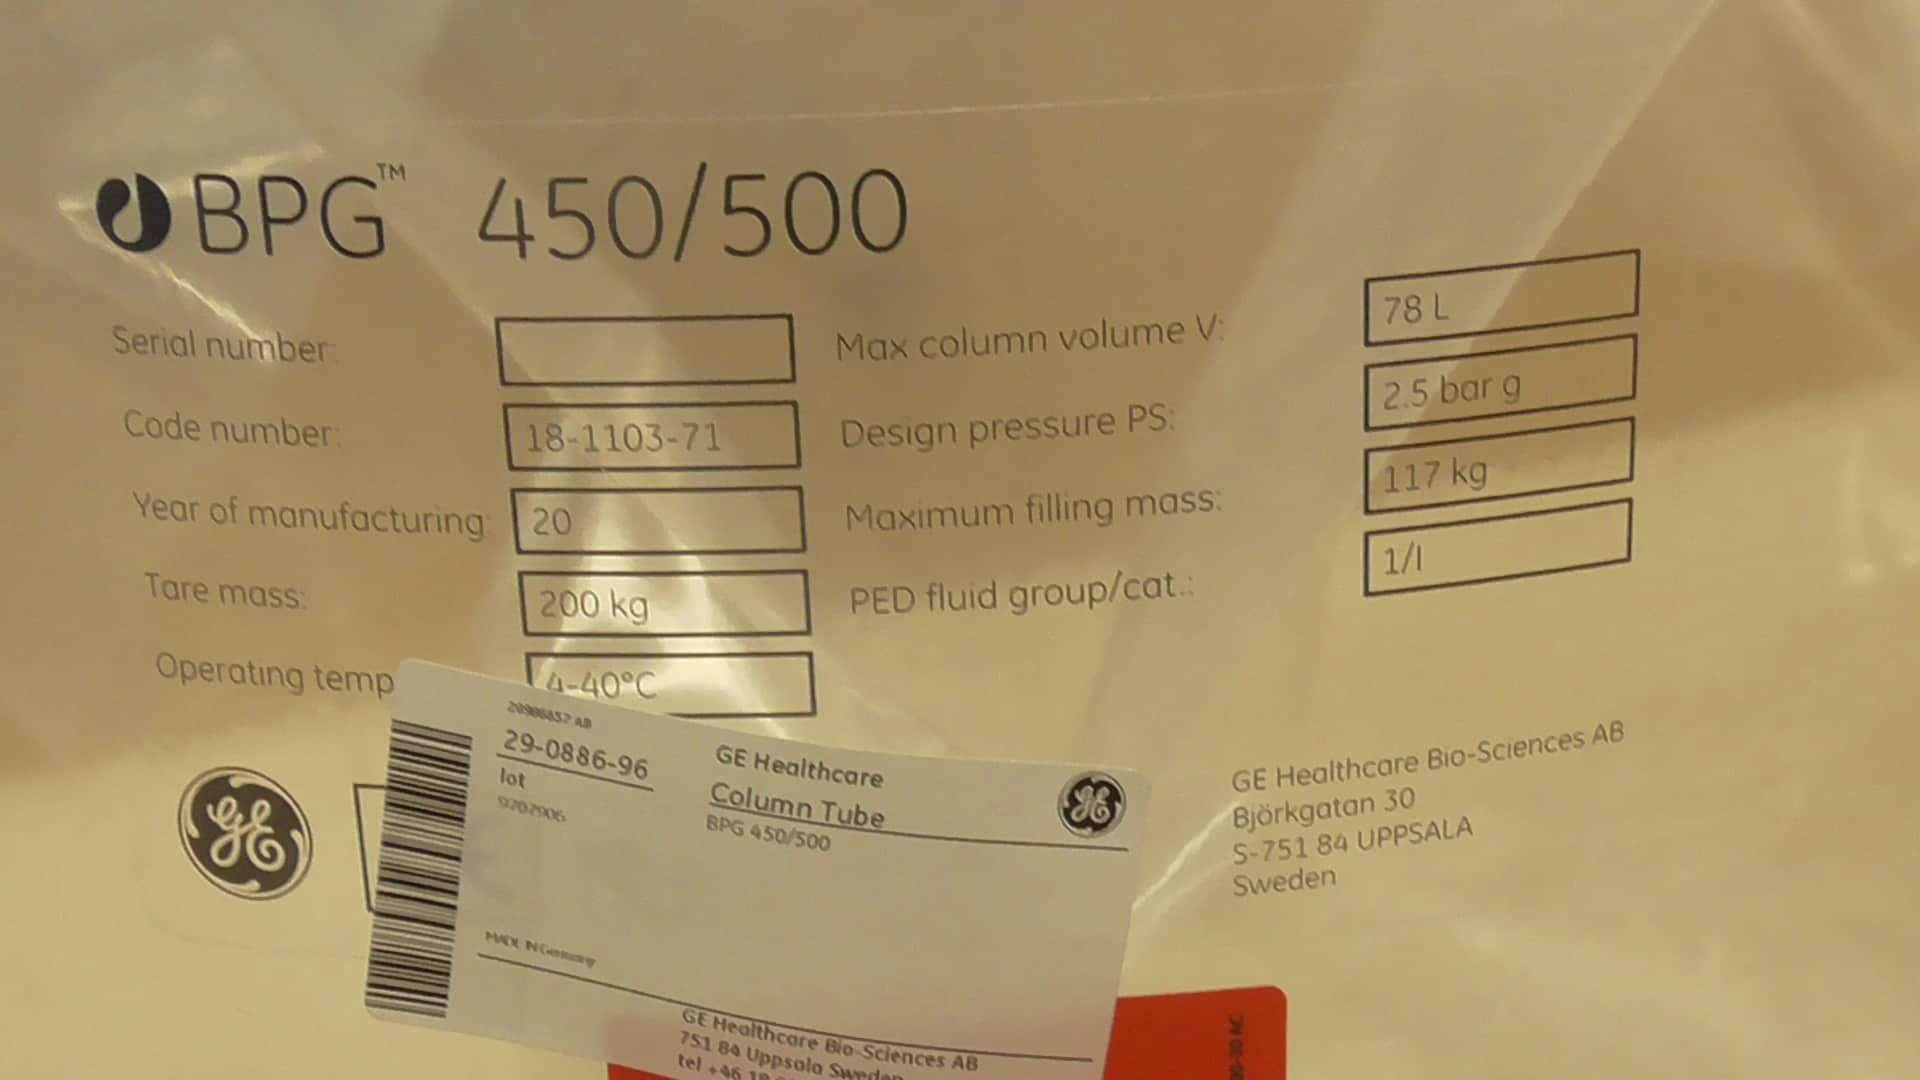 GE Healthcare BPG 450-500 Glass Column